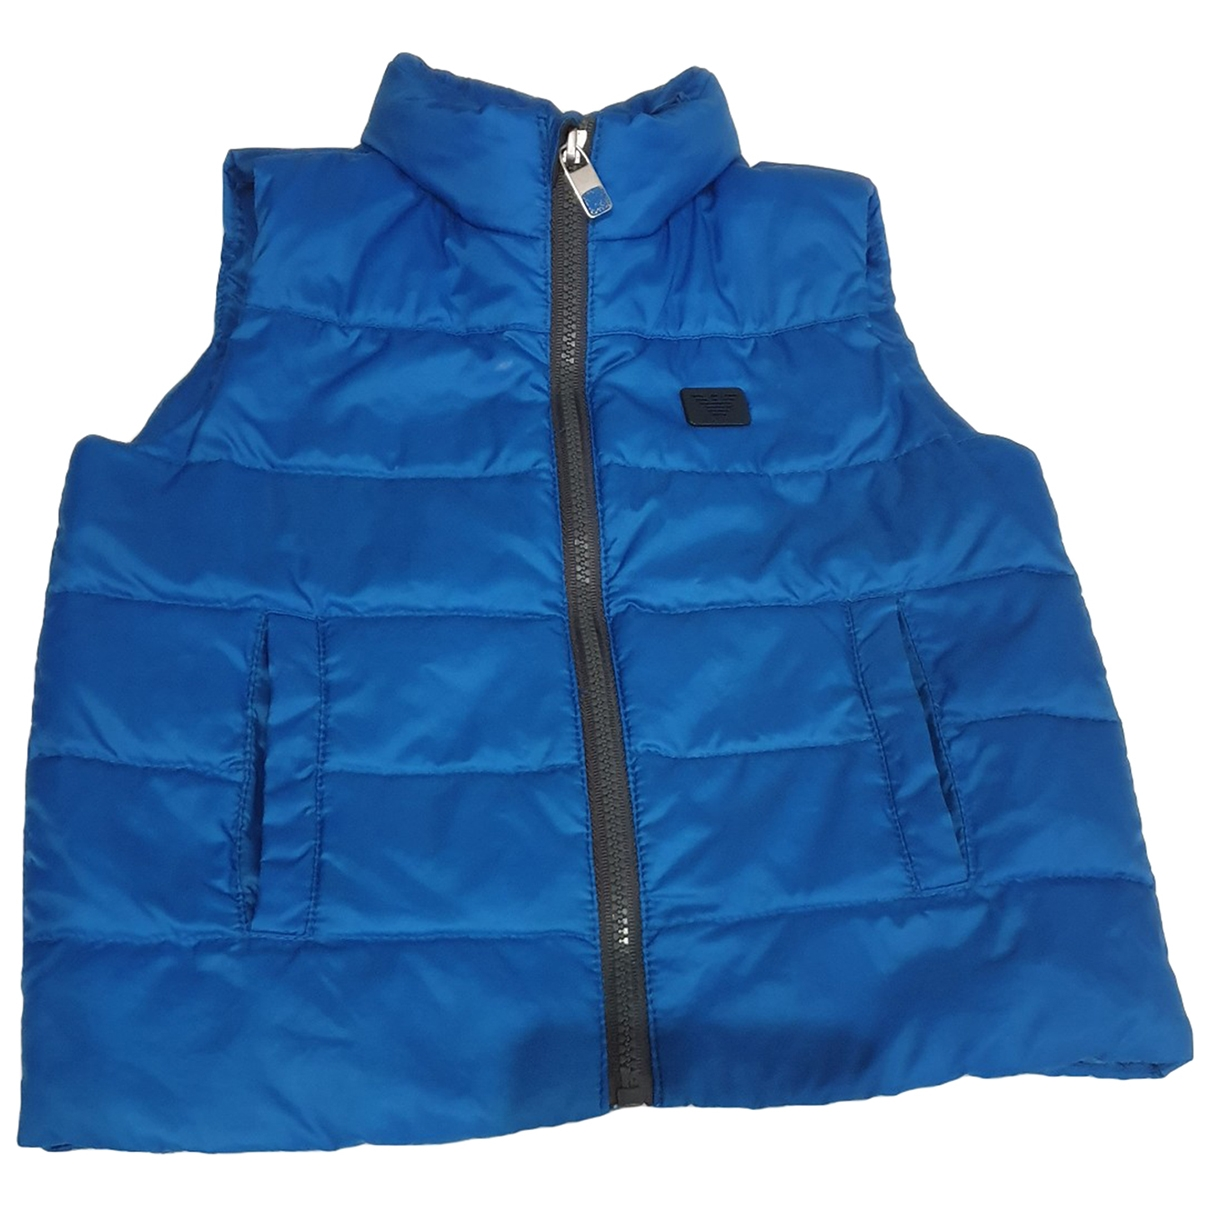 Armani Baby \N Blue jacket & coat for Kids 12 months - up to 74cm FR